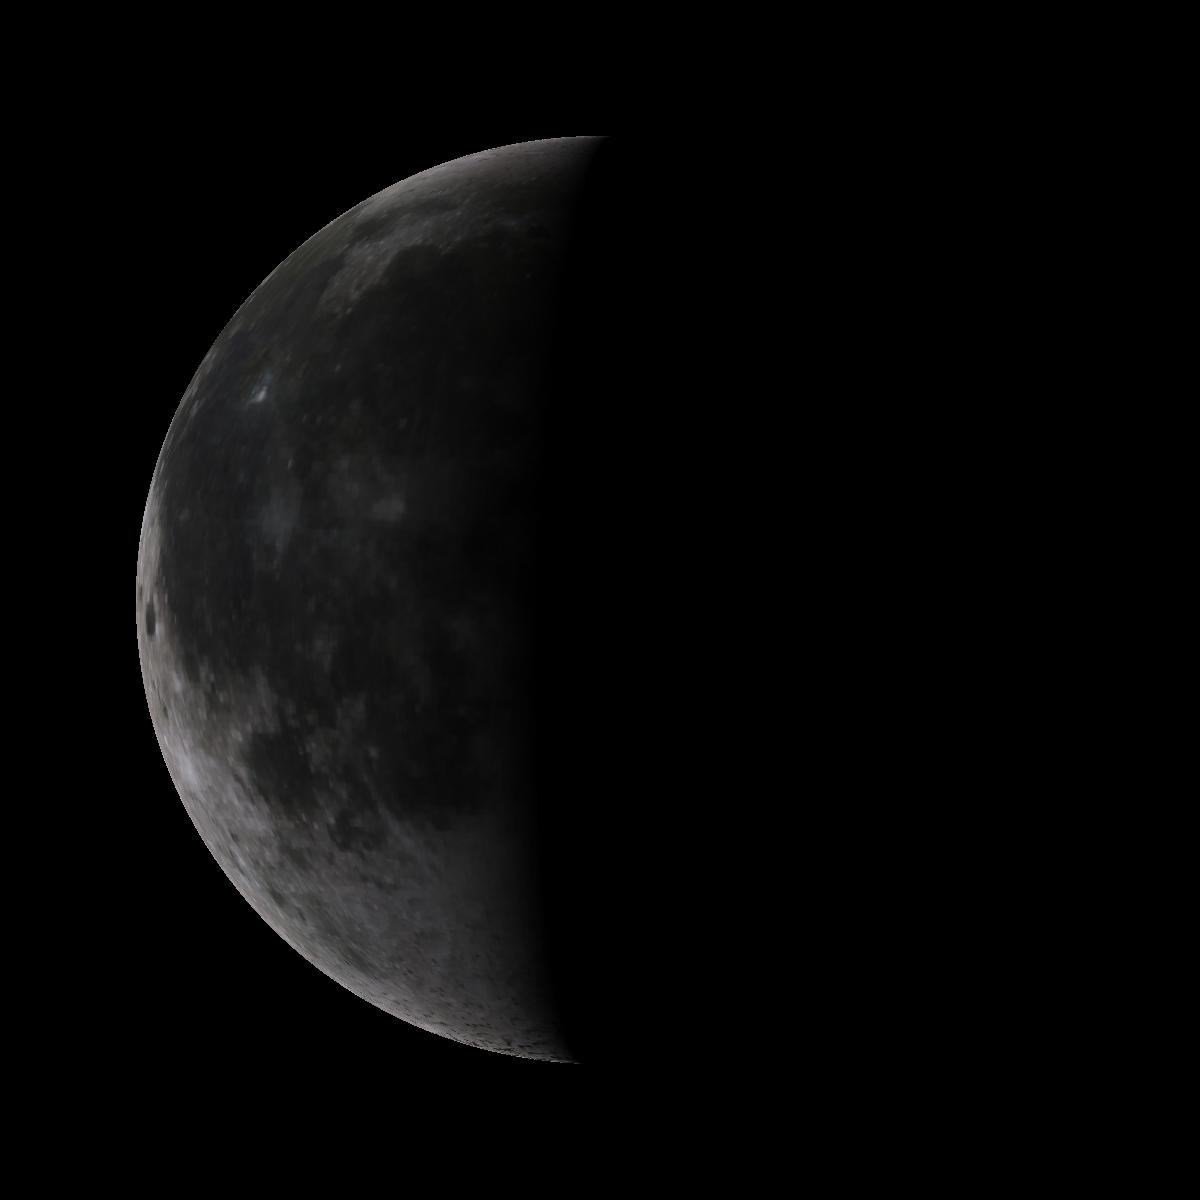 Lune du 17 mars 2020